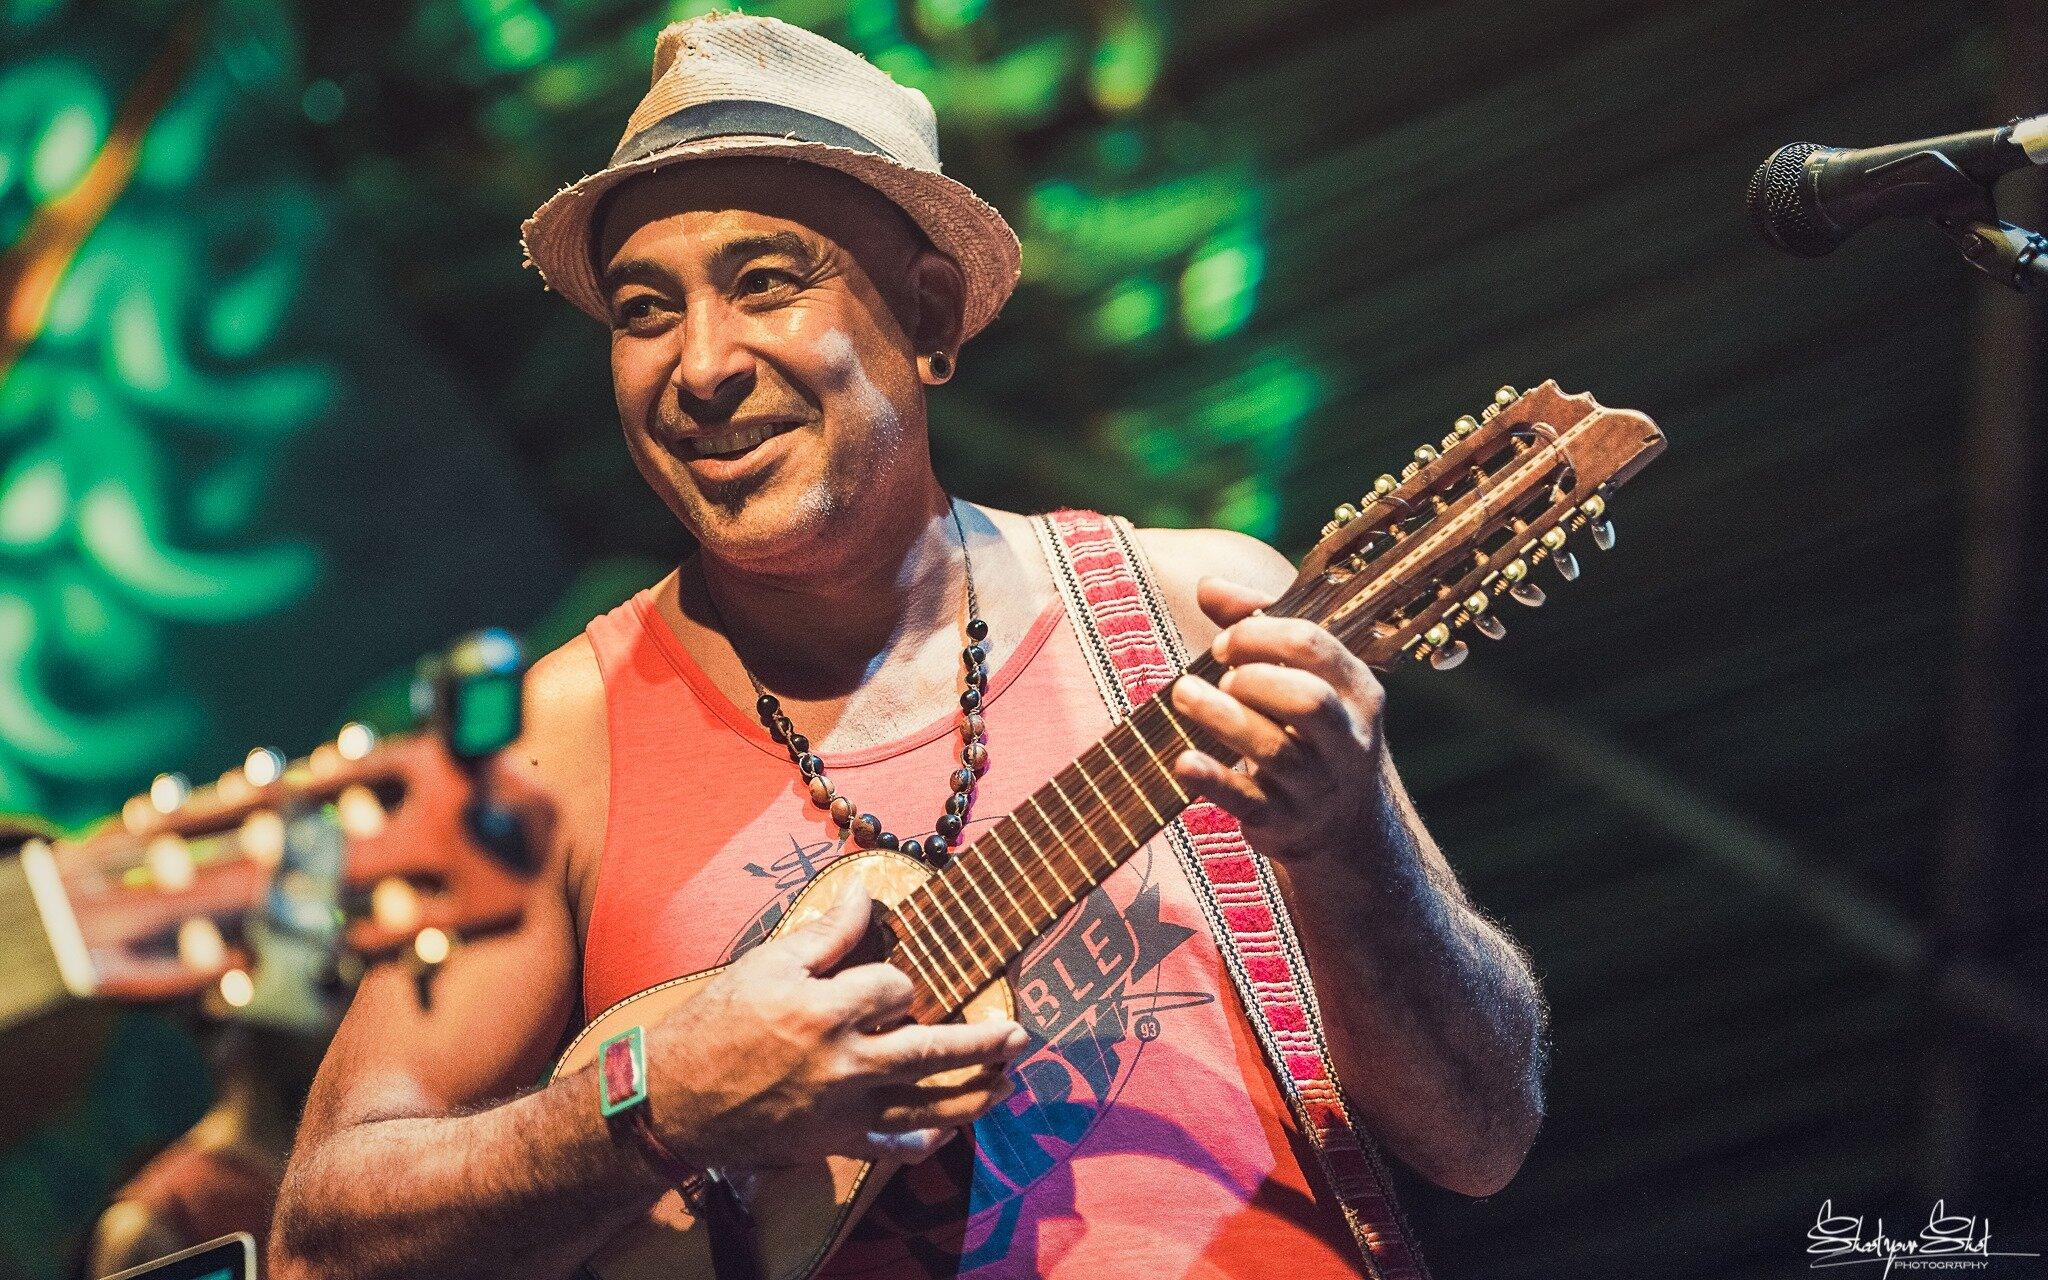 Pachamama-charrua-indigenous-music-tribal-gathering-panama.jpg